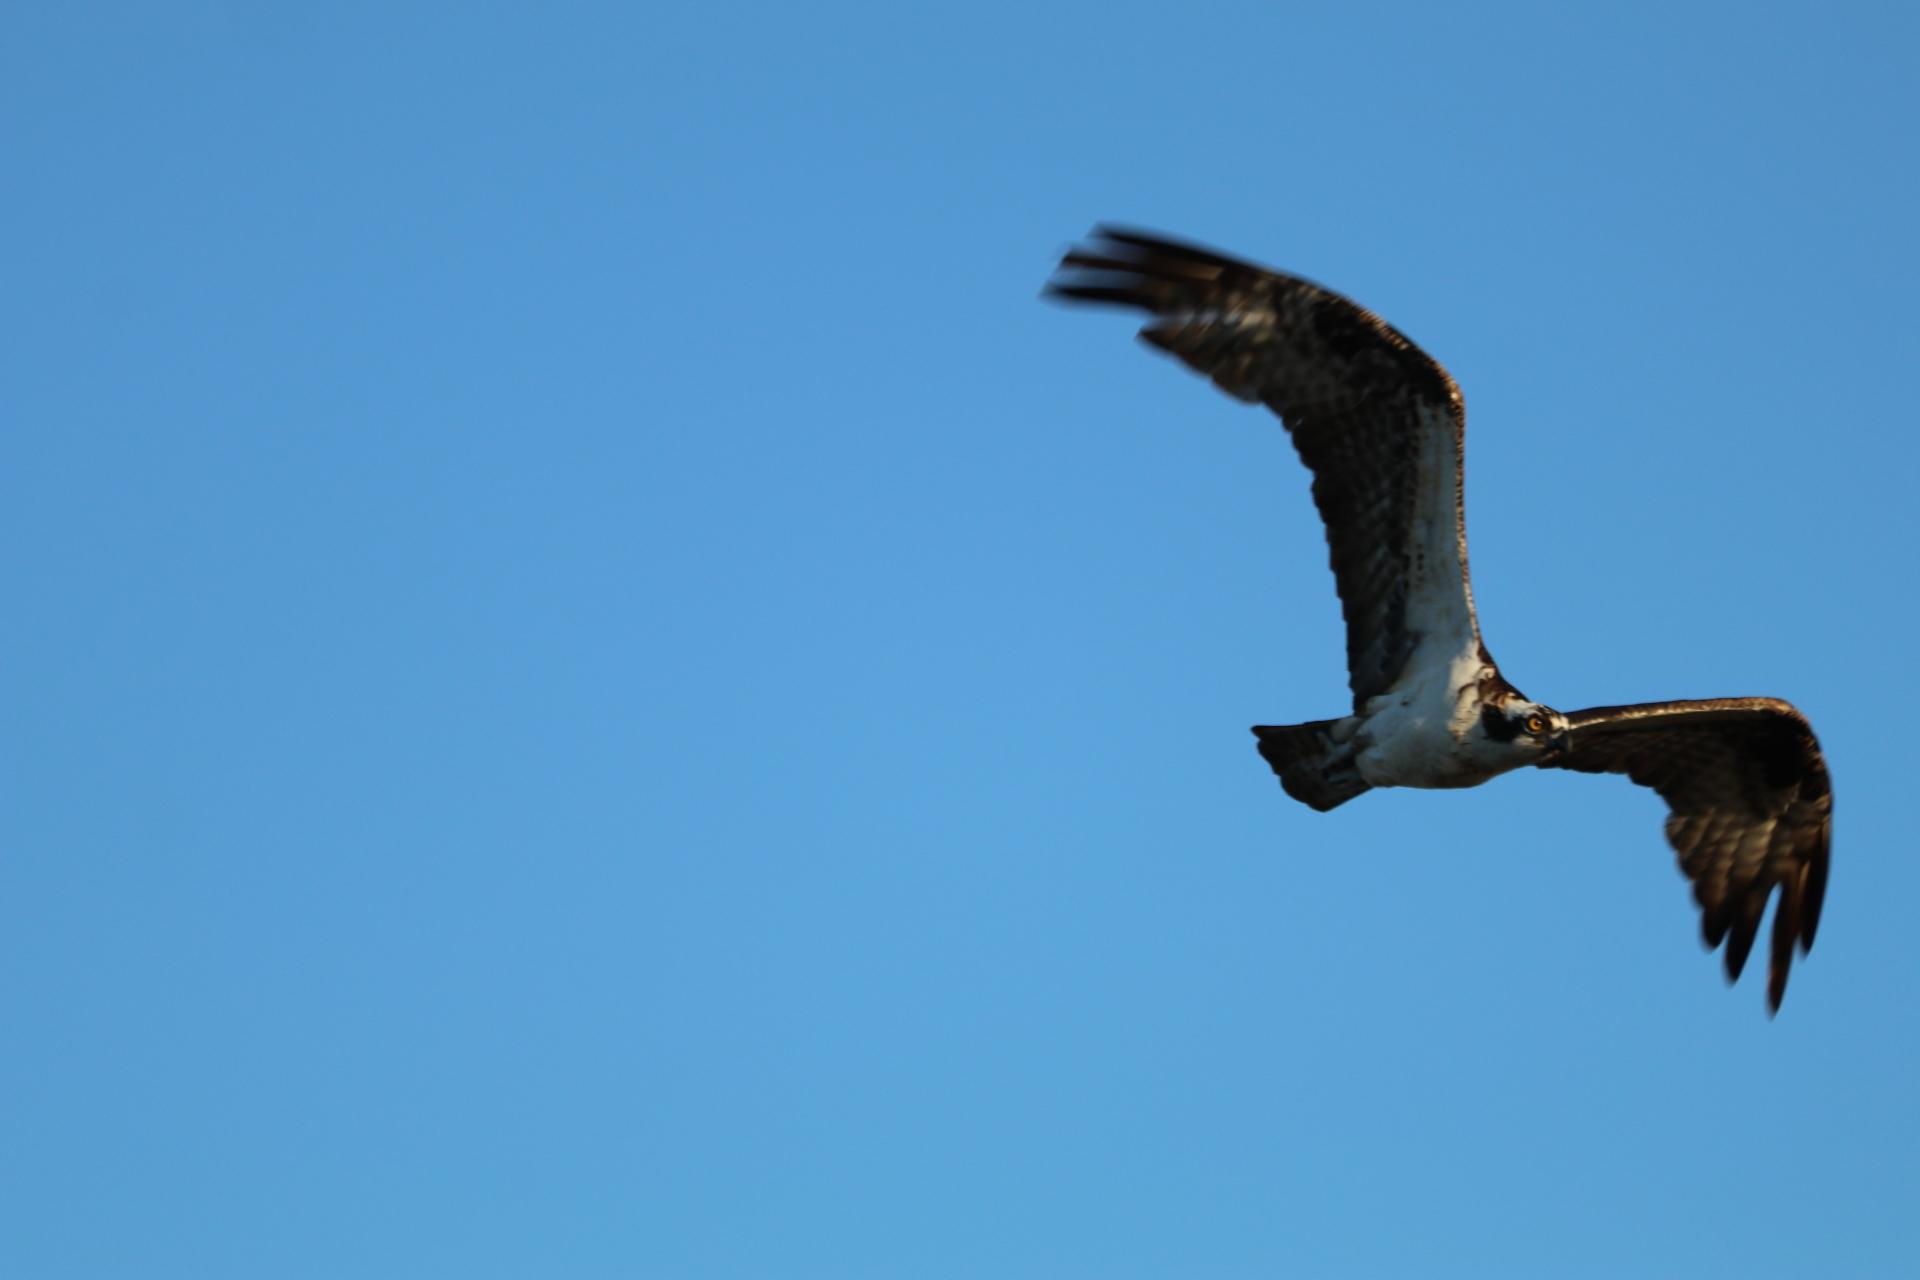 More Osprey in Flight